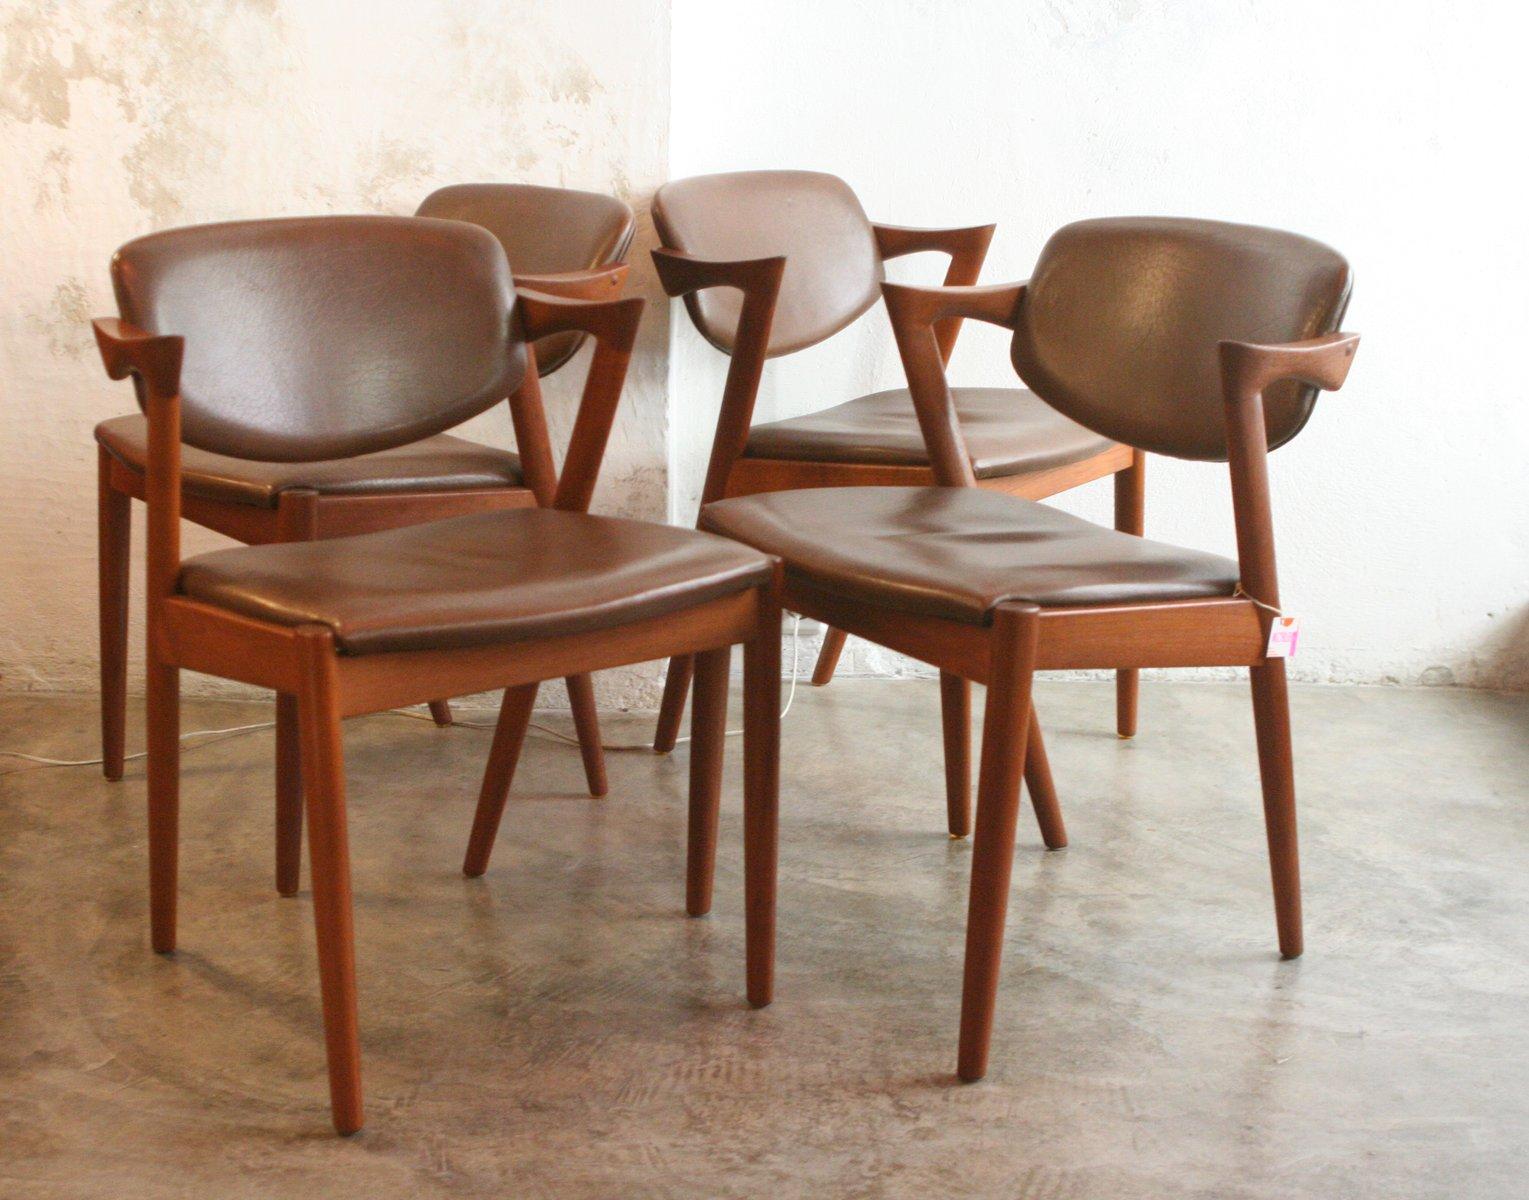 Sedie Vintage Pelle : Sedie modello nr. 42 vintage in teak e pelle di kai kristiansen set